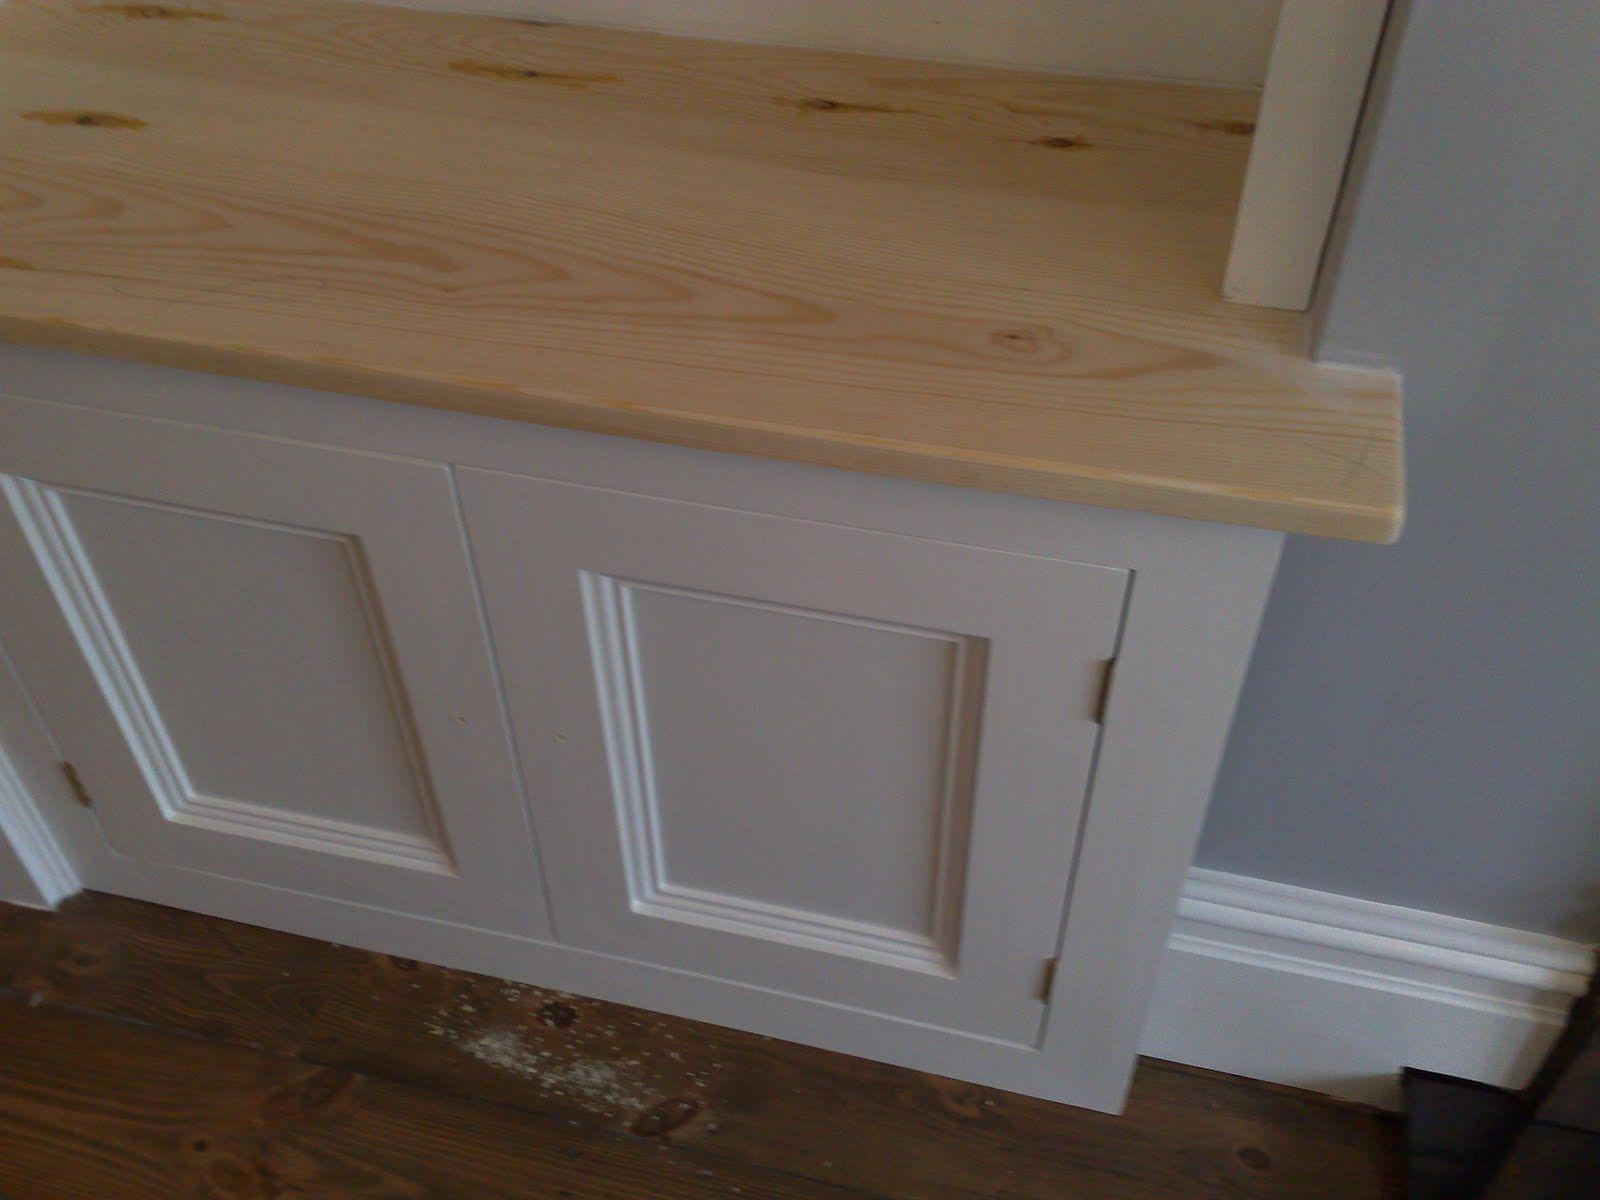 becky bell cabinetmaker bespoke kitchens london alcove cabinets